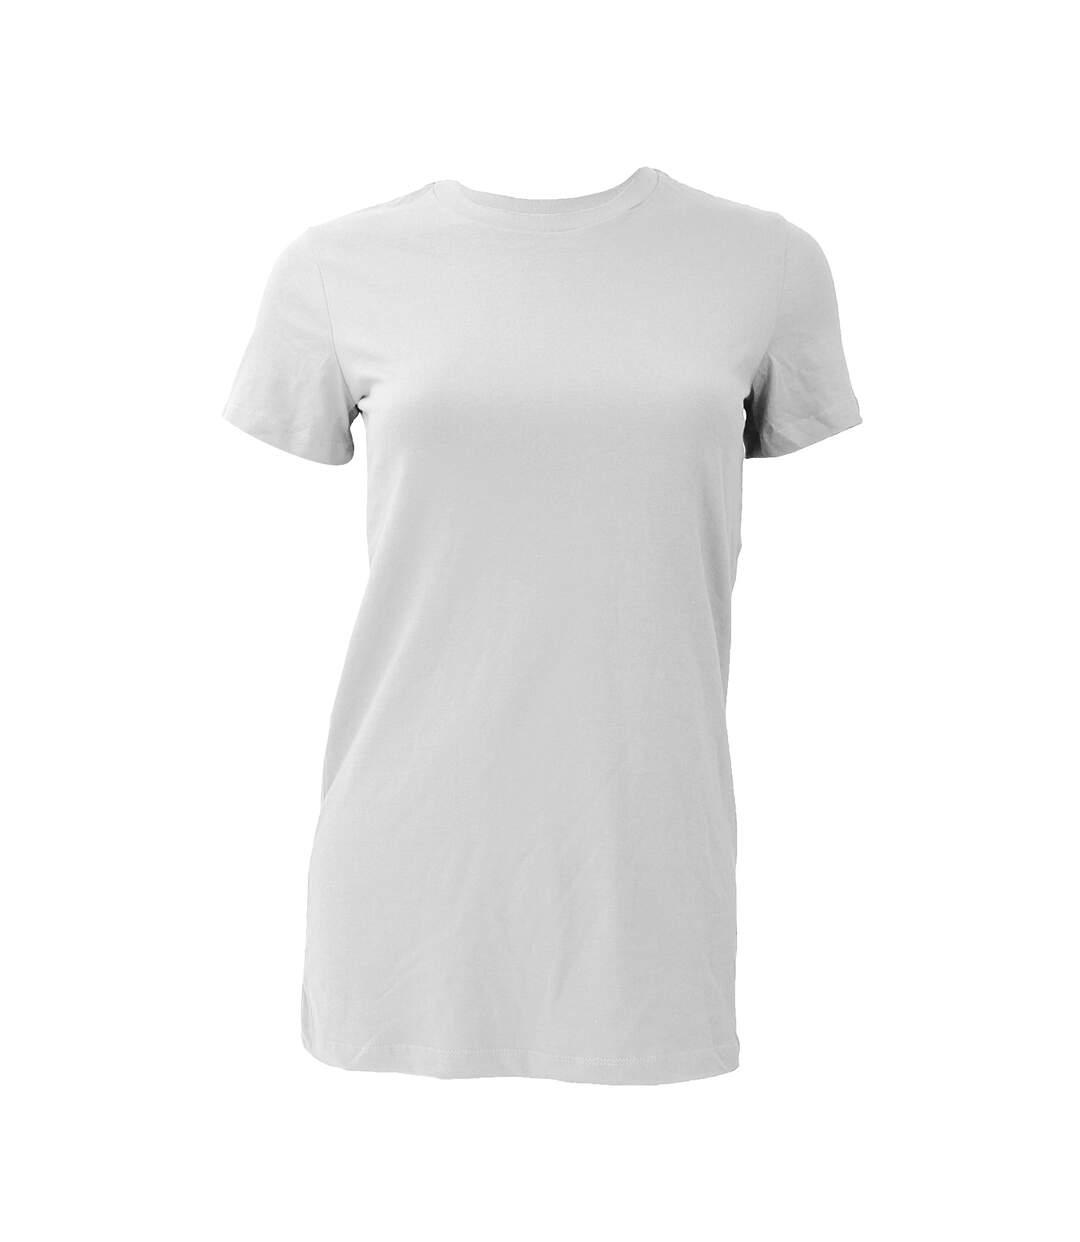 Bella The Favourite Tee - T-Shirt À Manches Courtes - Femme (Blanc) - UTBC1318